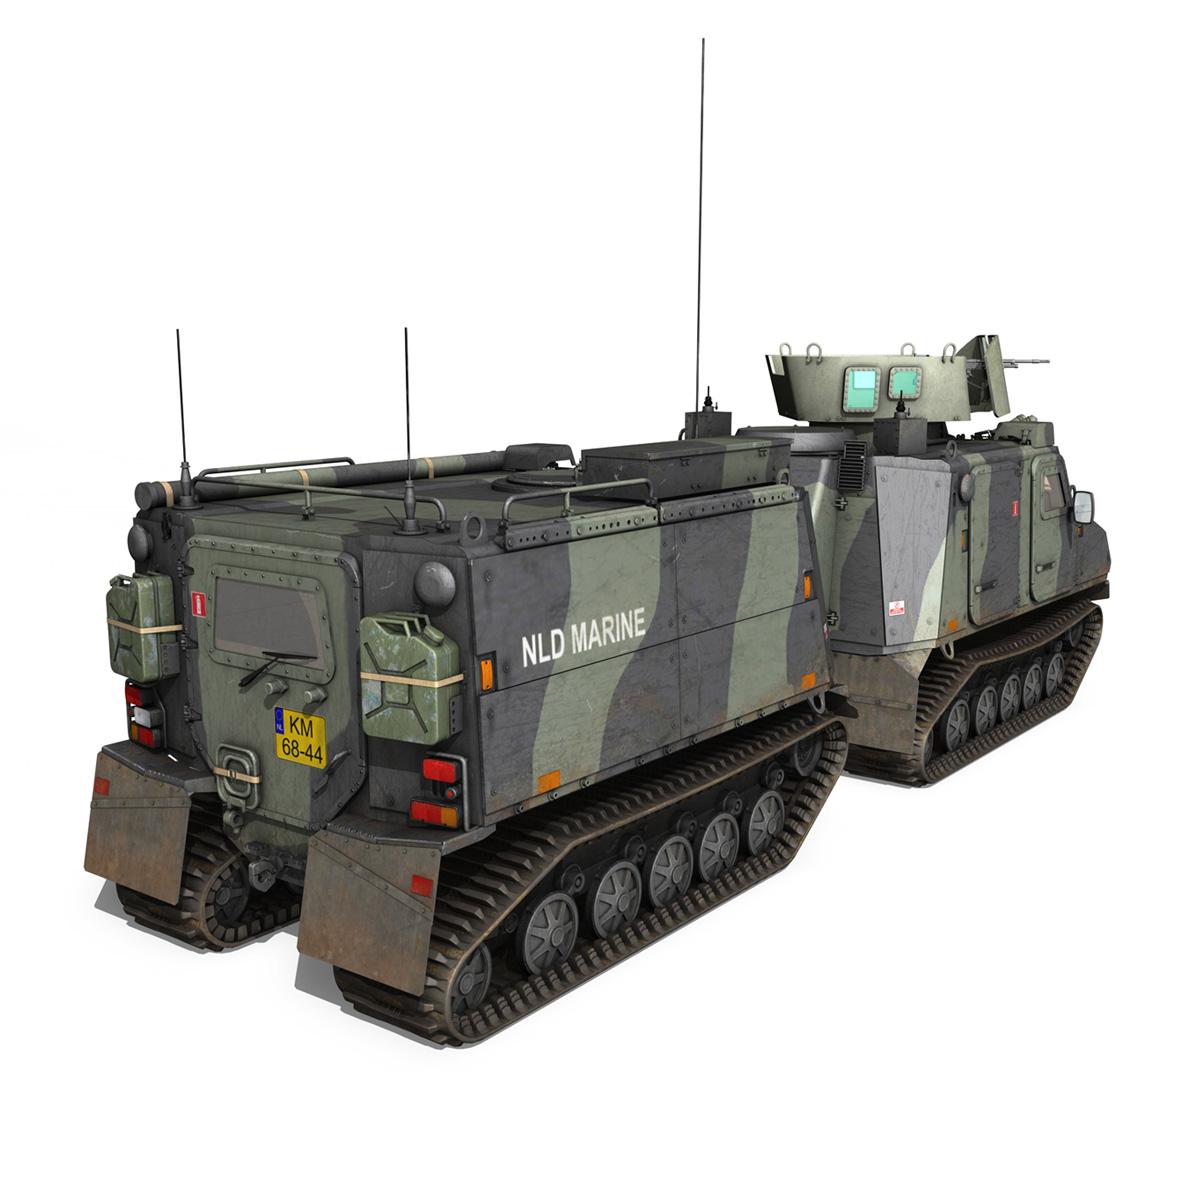 bvs10 viking – netherlands marine corps 3d model 3ds c4d lwo obj 293520